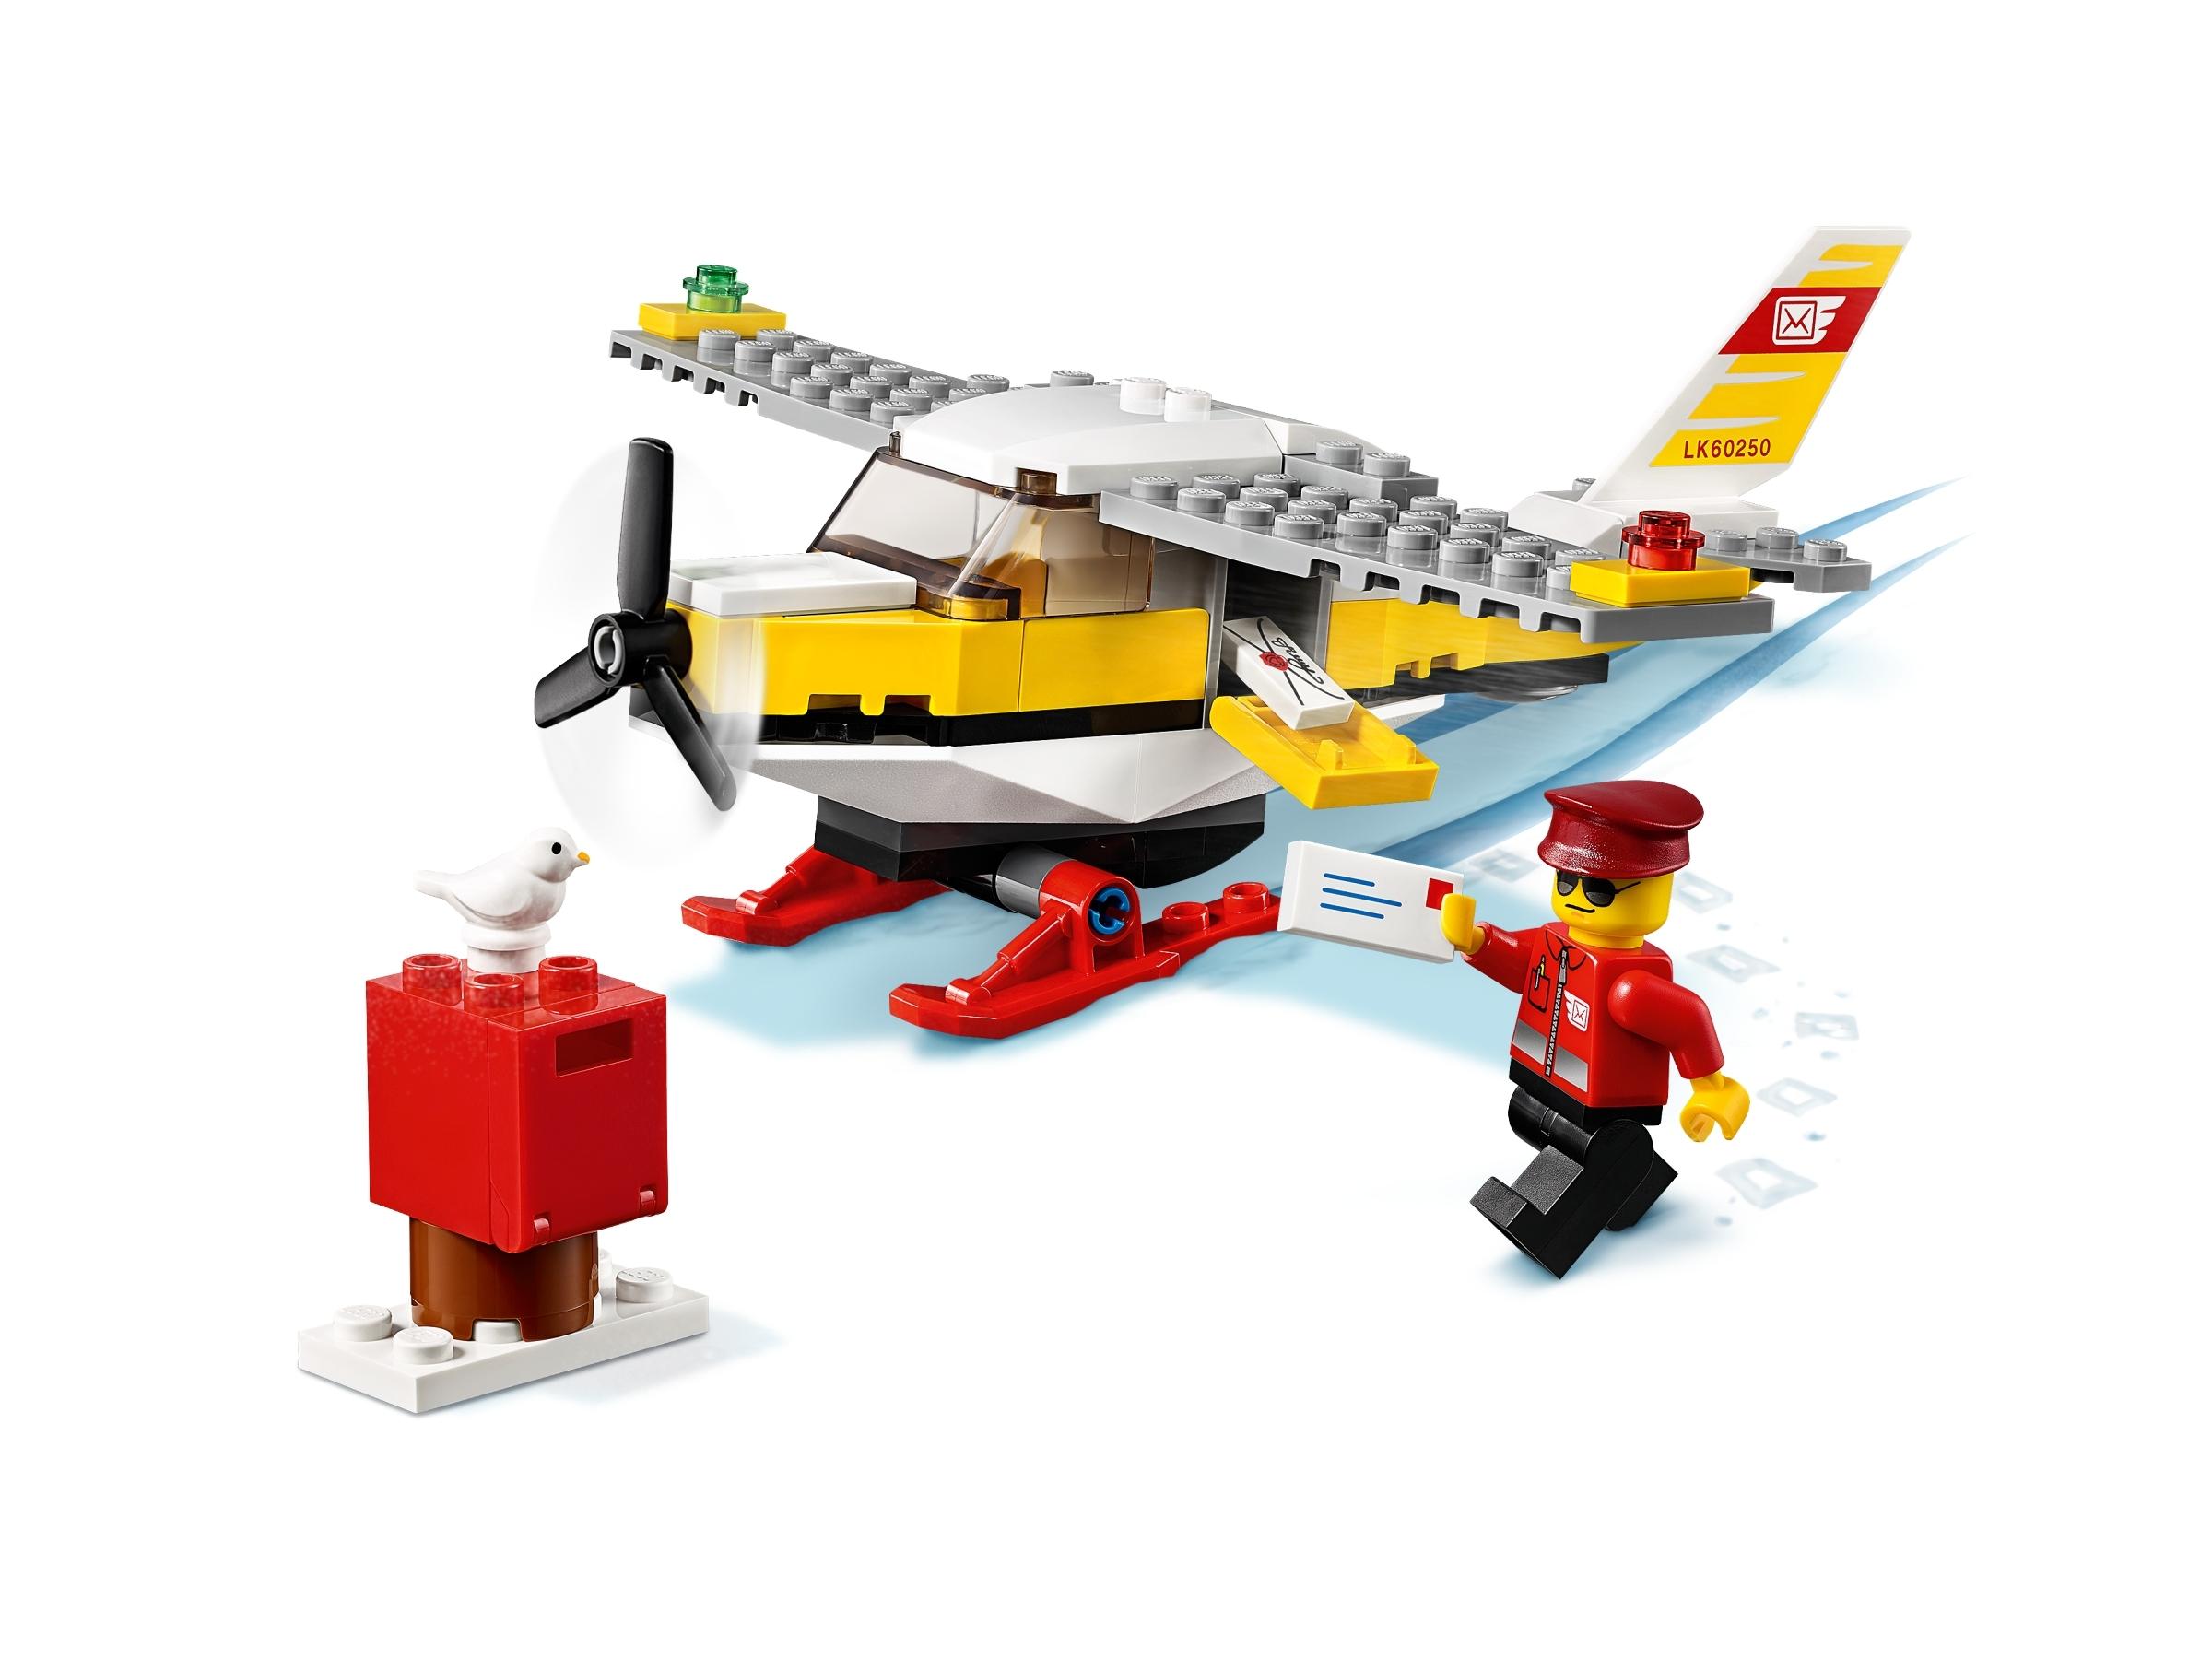 74 Pieces Lego 60250 LEGO City Mail Plane 60250 Building Set for Kids New 2020